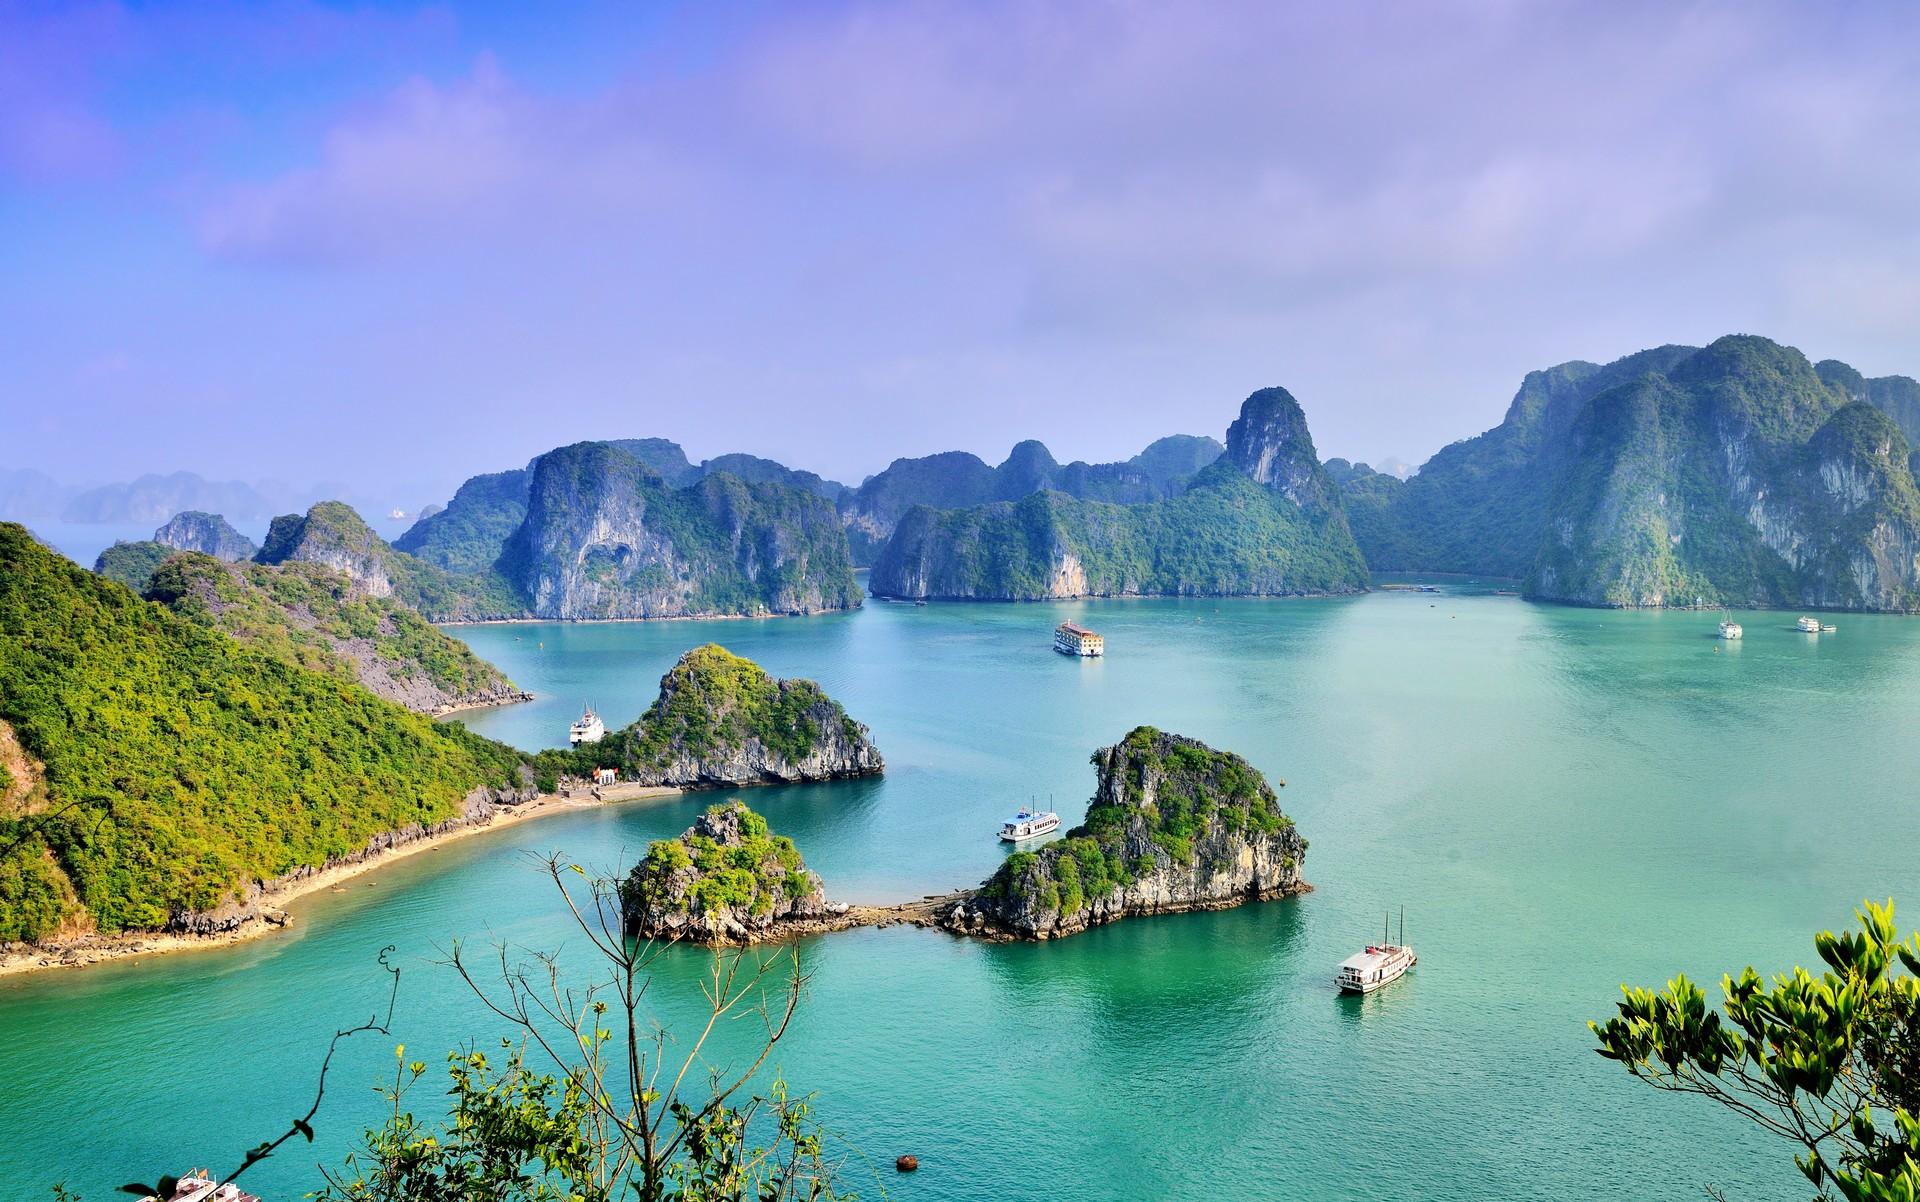 Top 10 scenic journeys: HaLong Bay